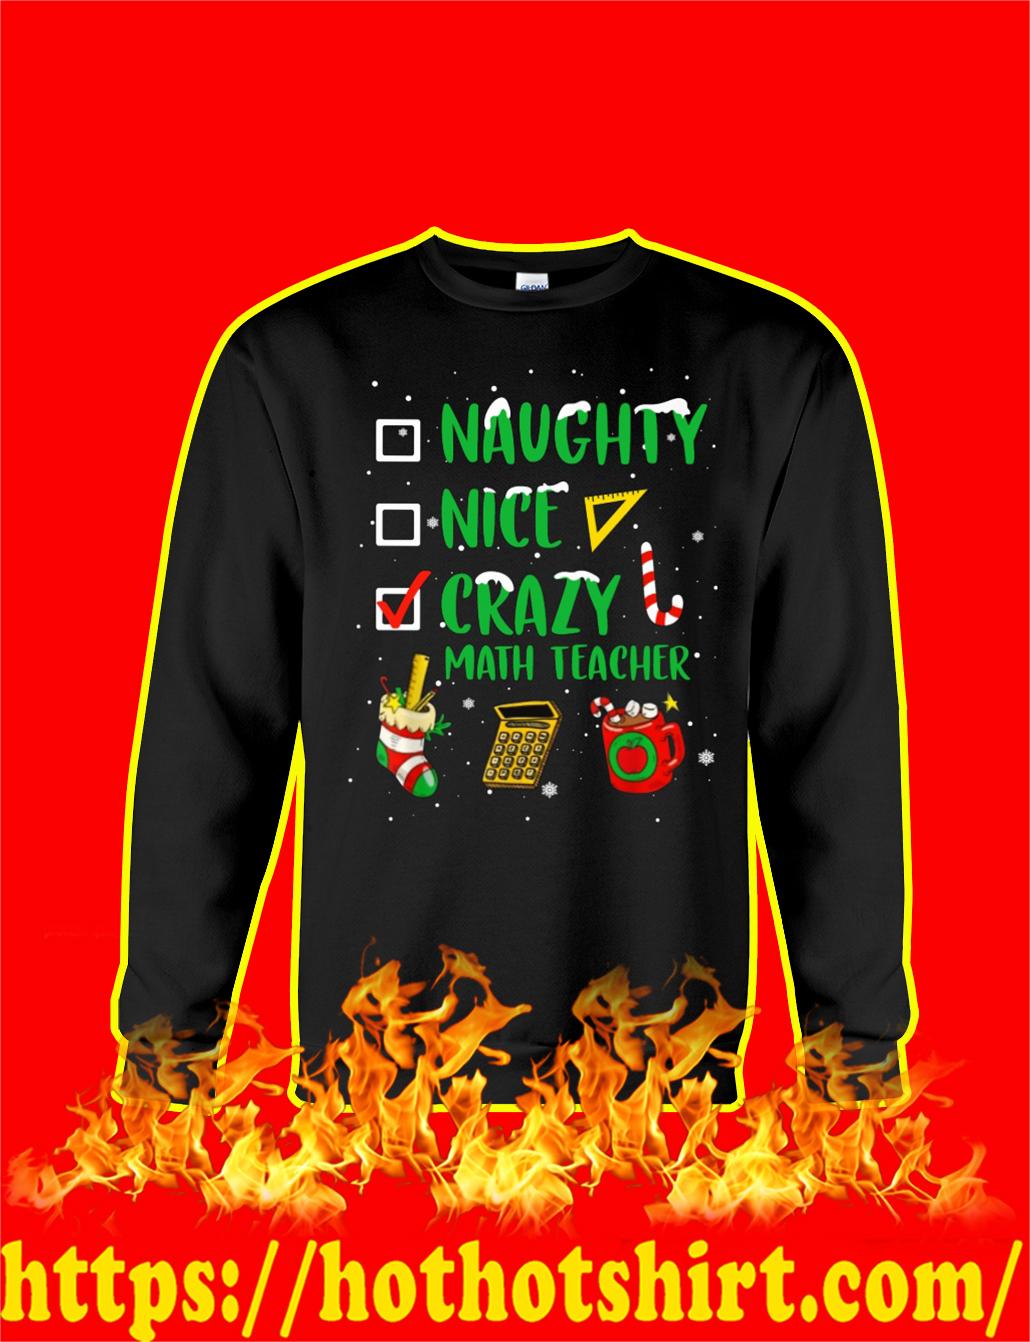 Naughty Nice Crazy Math Teacher Christmas Sweatshirt